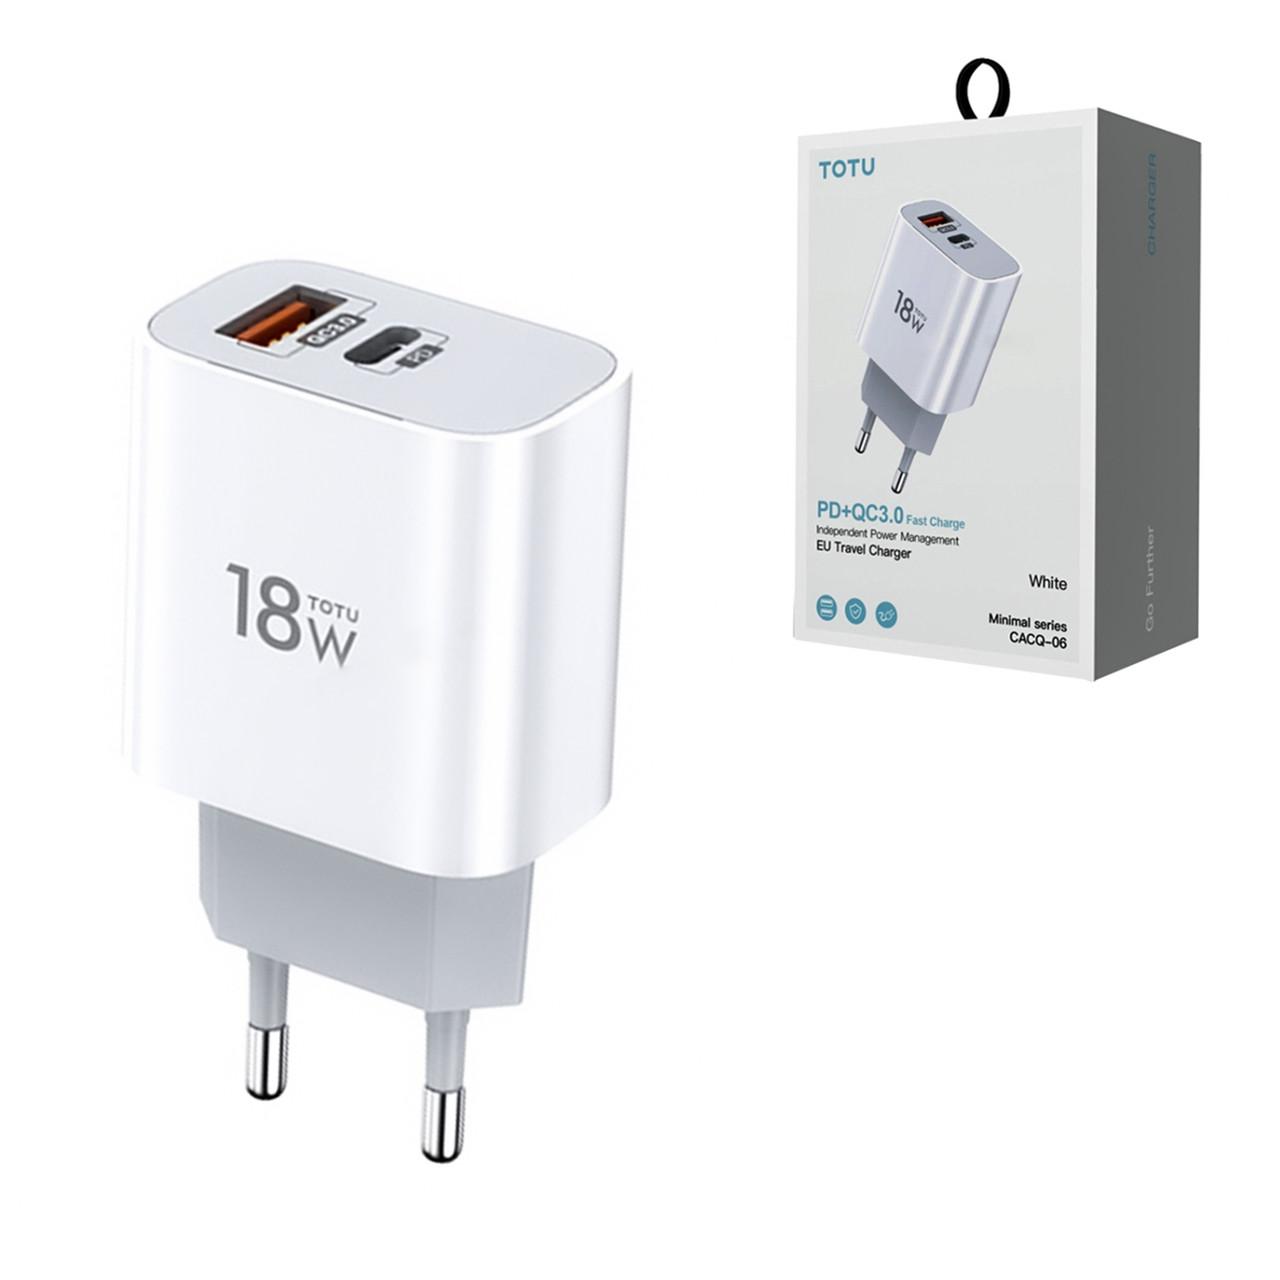 Сетевое зарядное устройство Totu Minimal Series CACQ-06 PD+QC3.0 18W, White